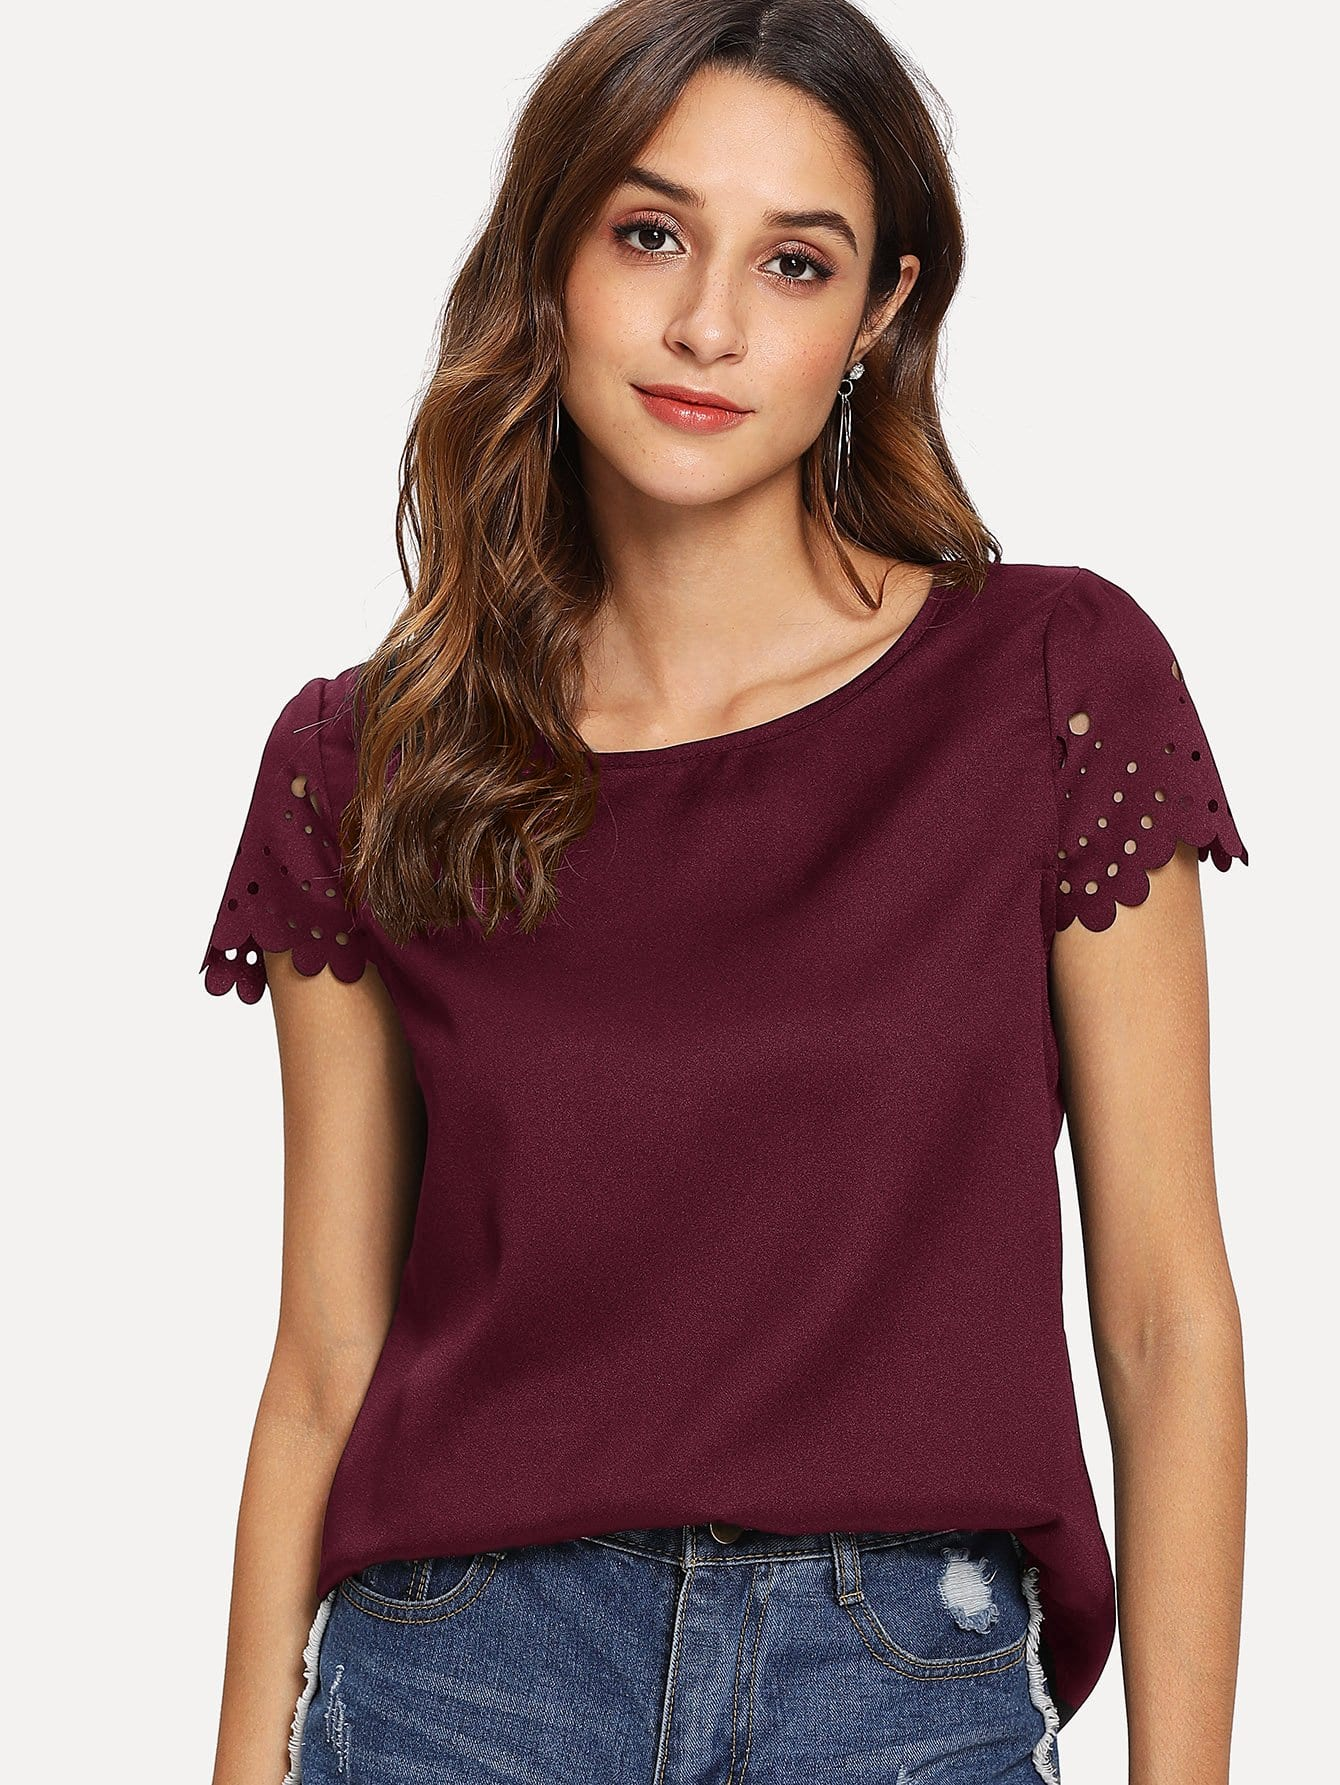 Купить Гребешок лазерная резка блузка с коротким рукавом, Jeane, SheIn